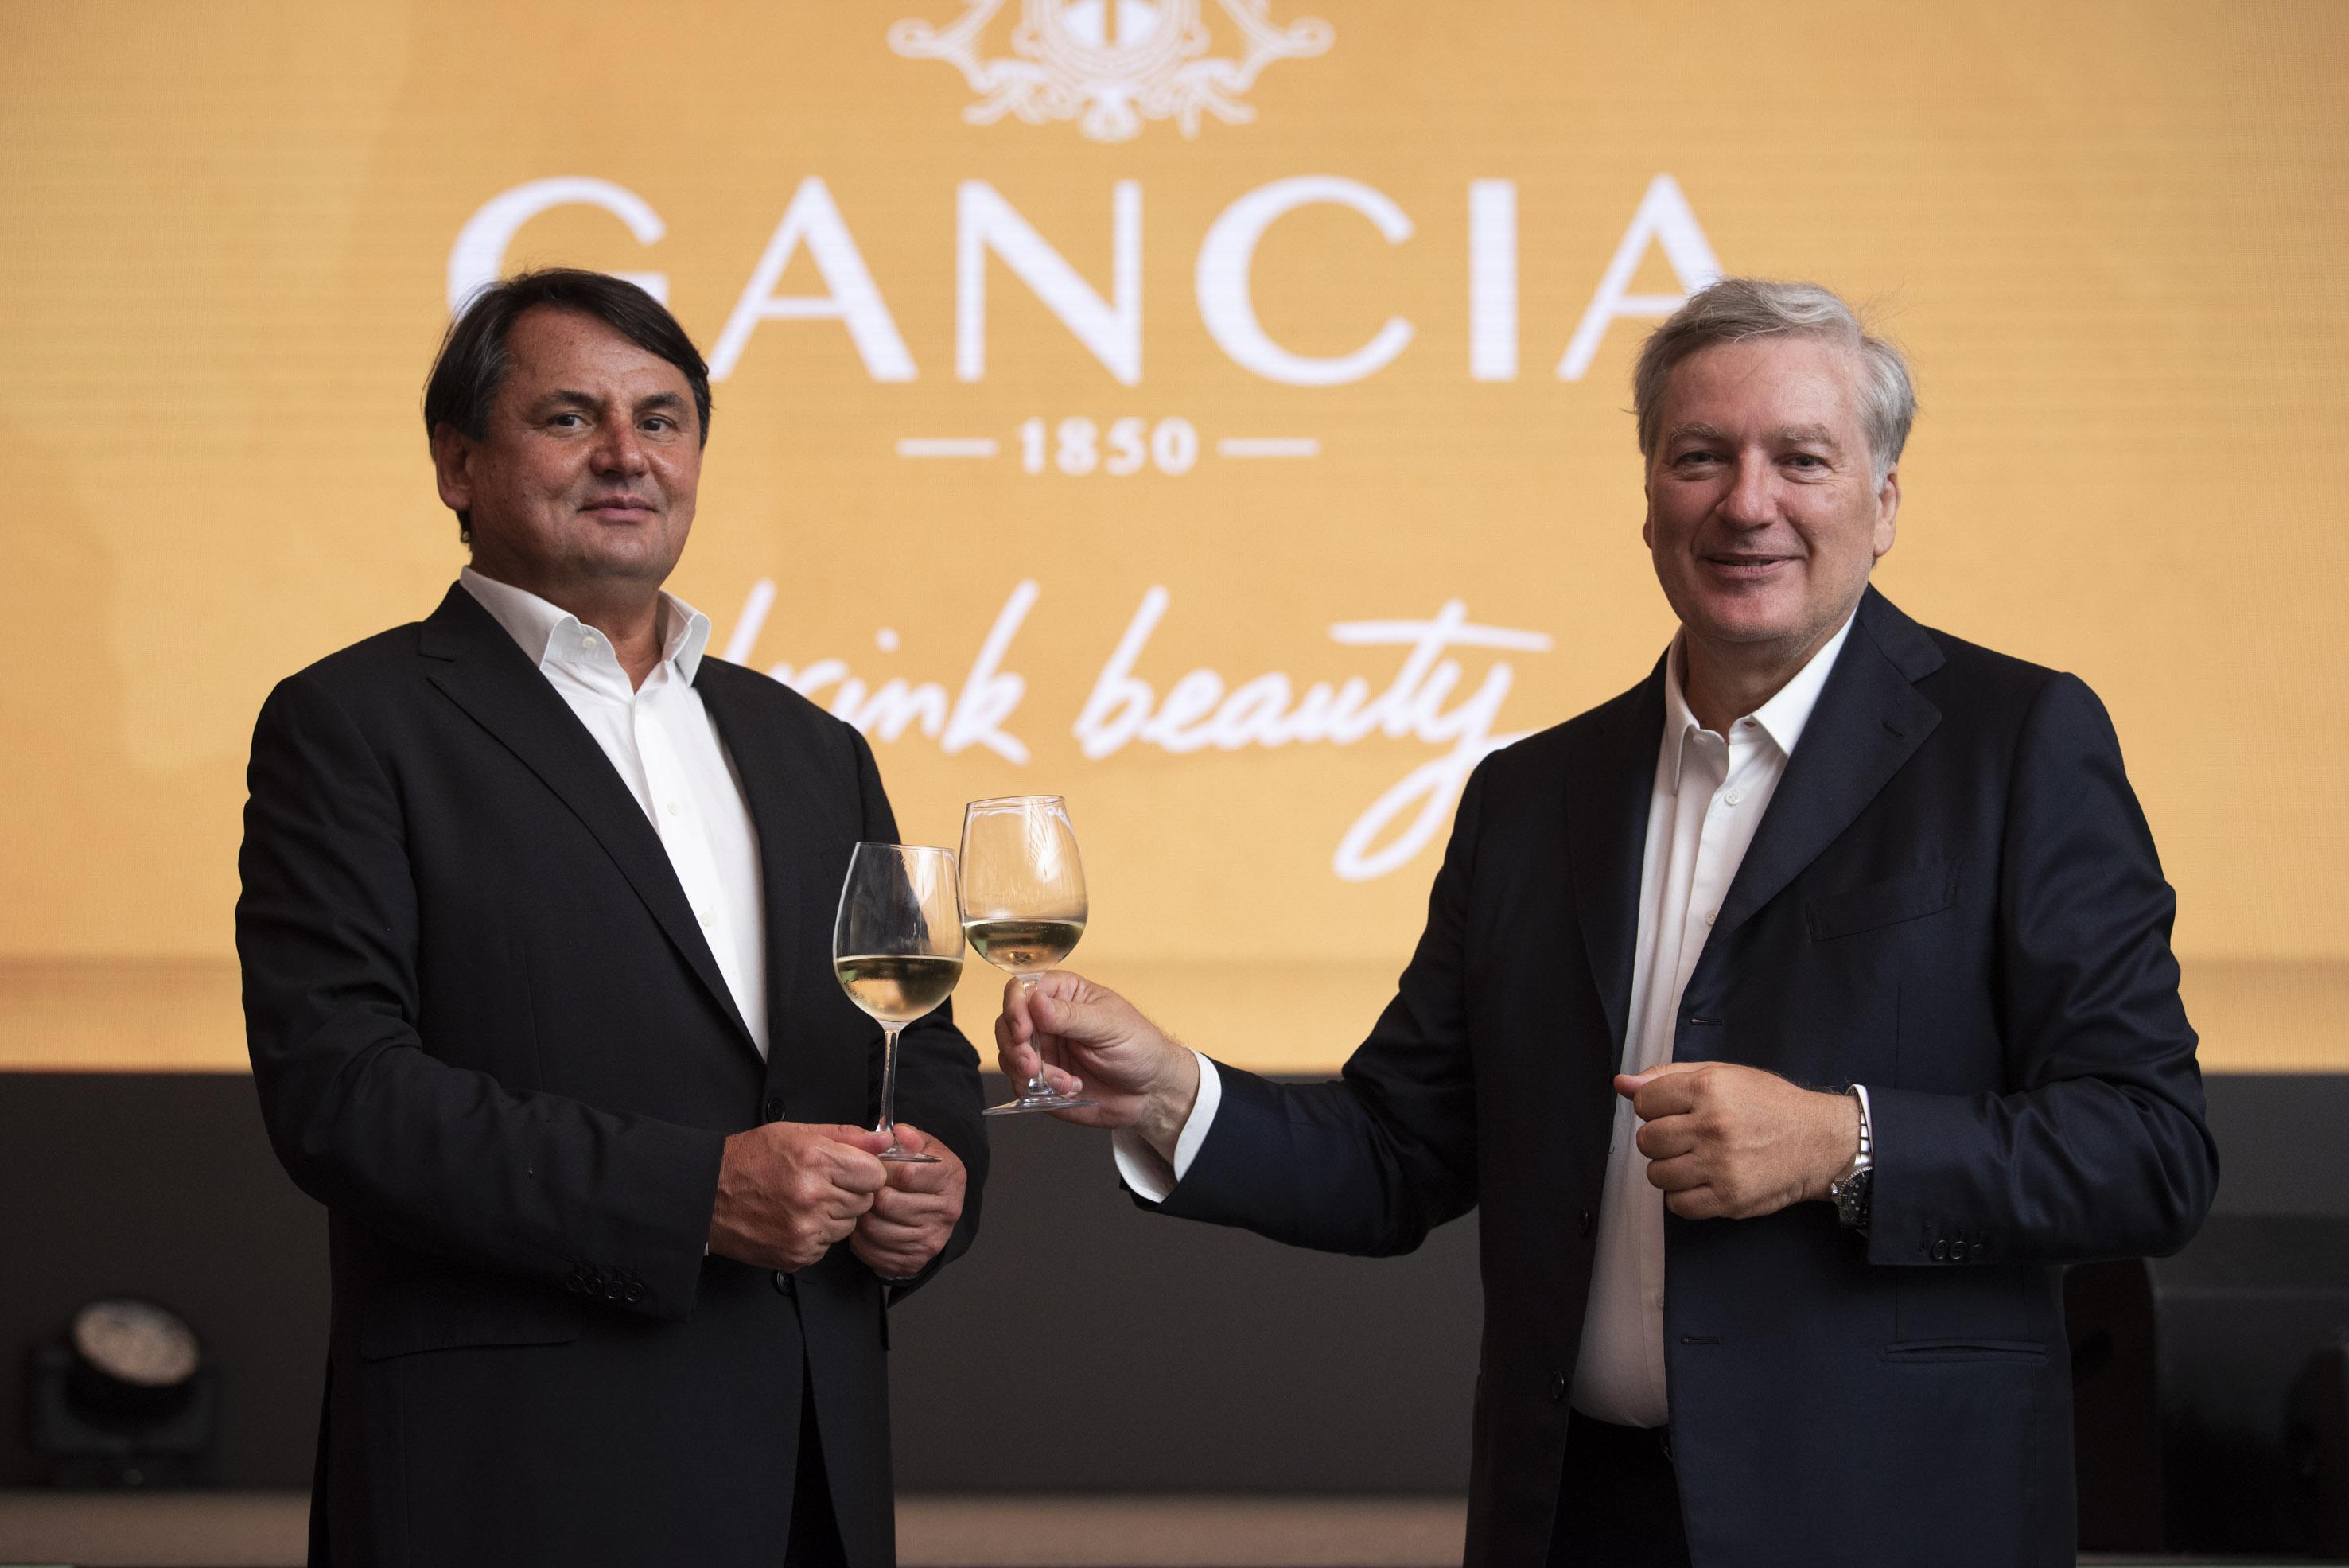 CASA GANCIA: DOPO ANNI TORNA L'UTILE A 4,6 MILIONI